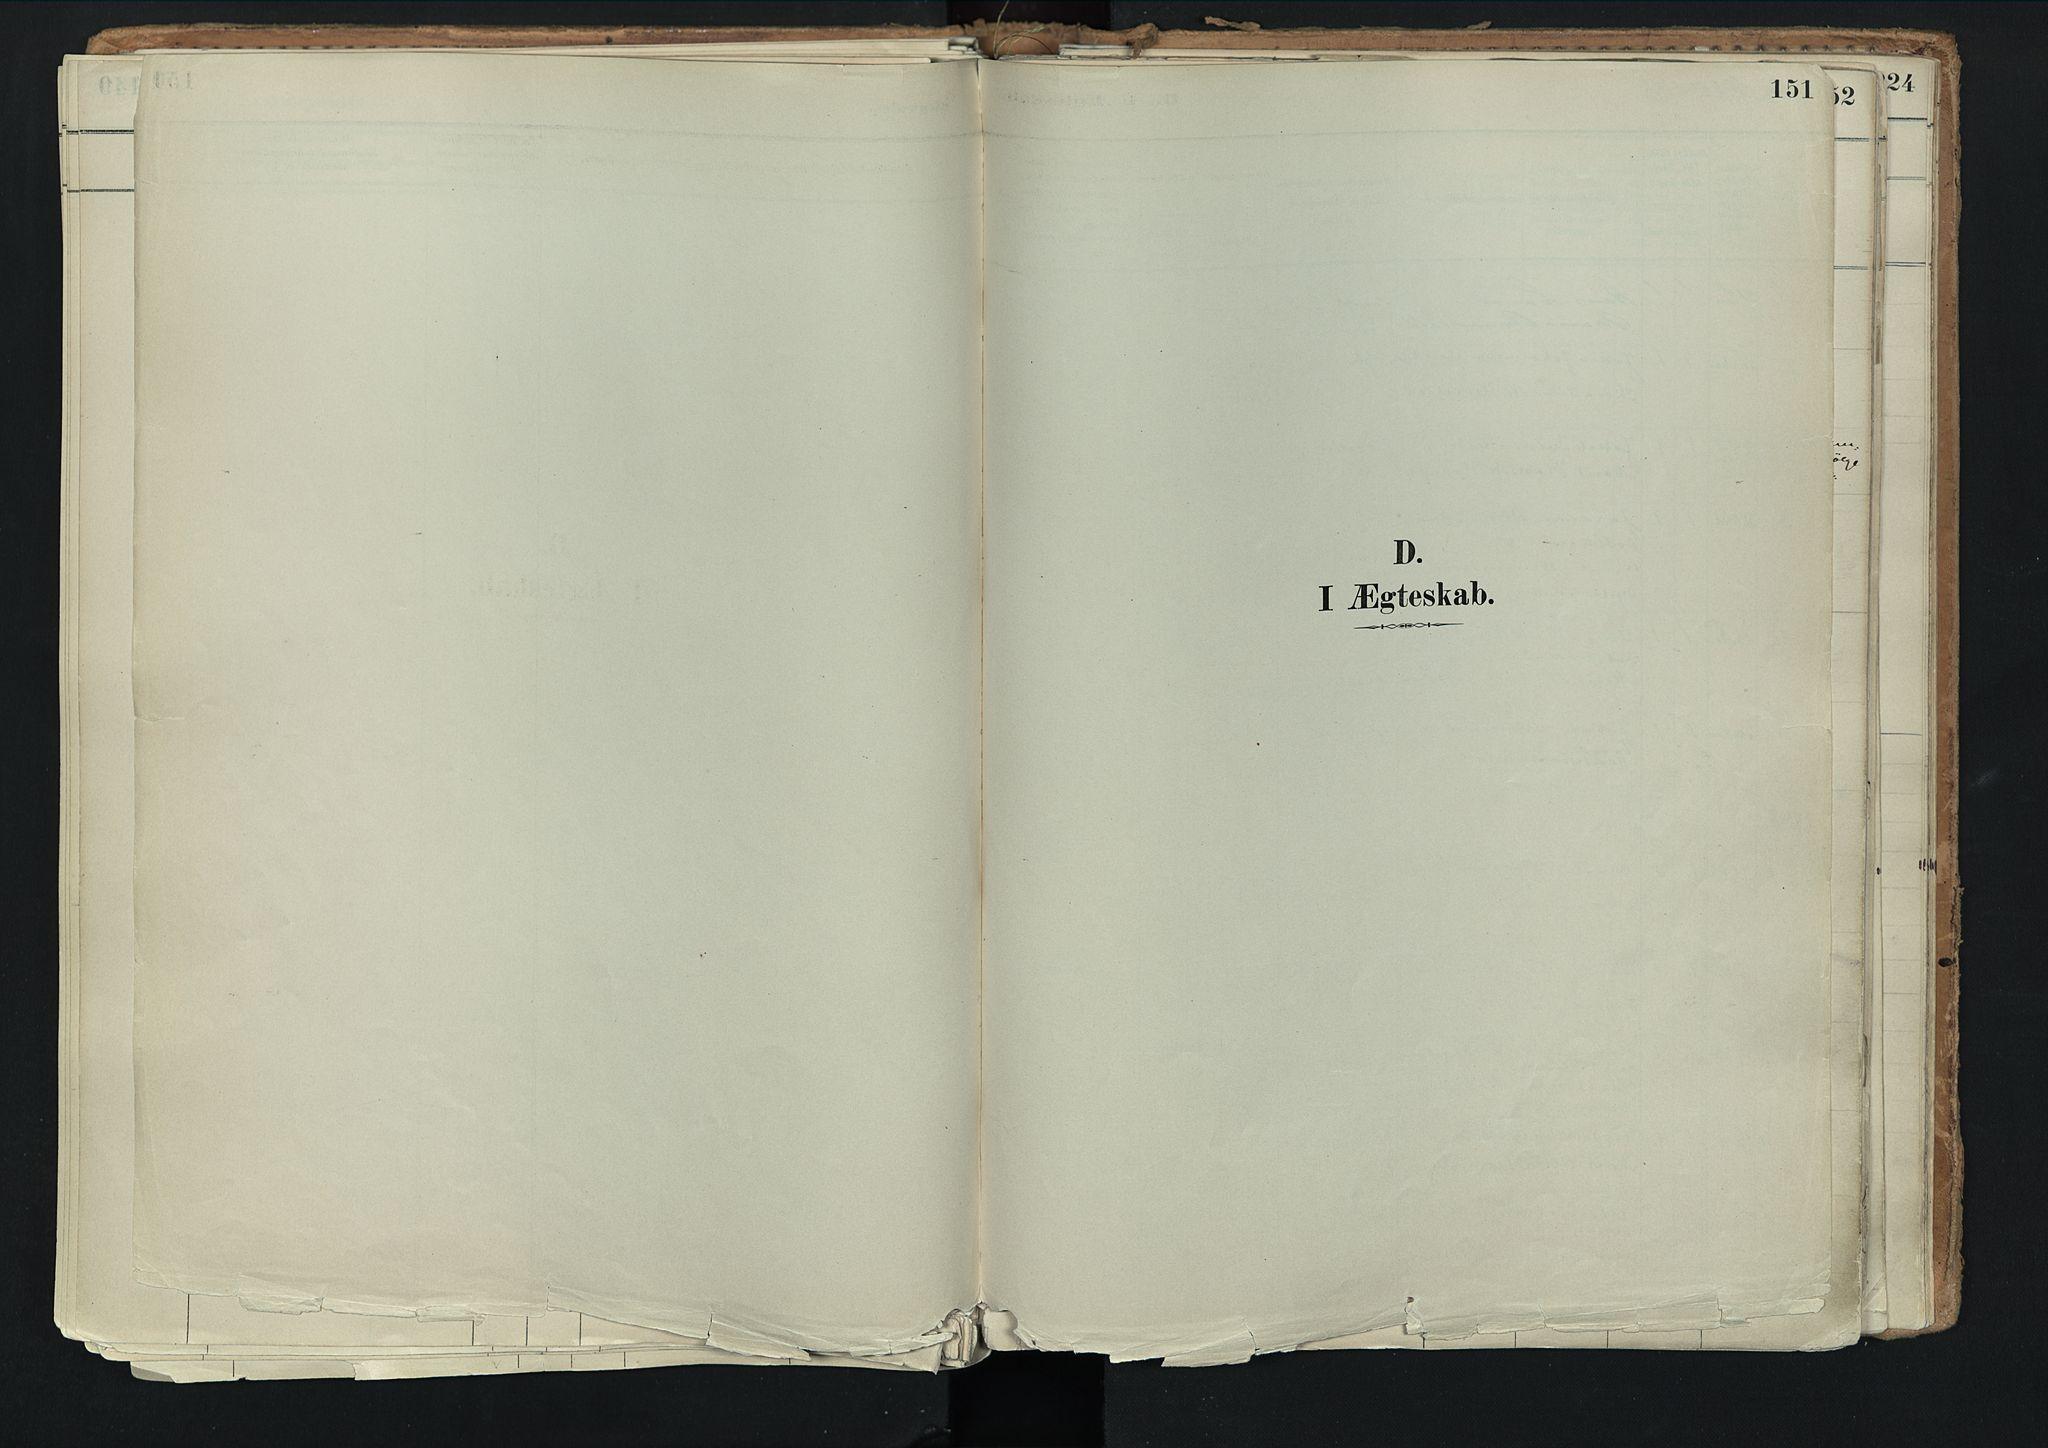 SAH, Nord-Fron prestekontor, Ministerialbok nr. 3, 1884-1914, s. 151